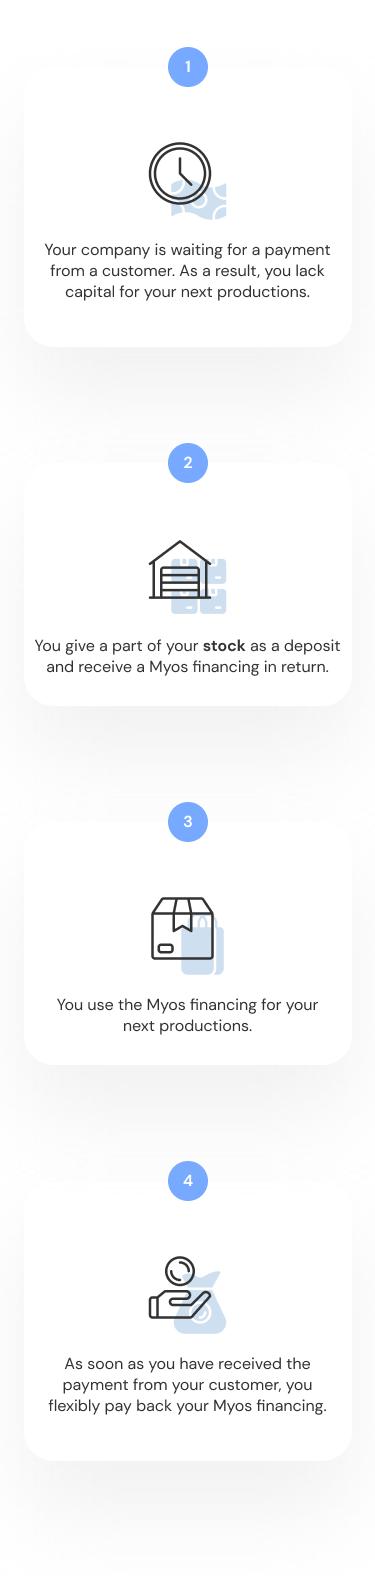 Infographic explaining the Myos cross financing.